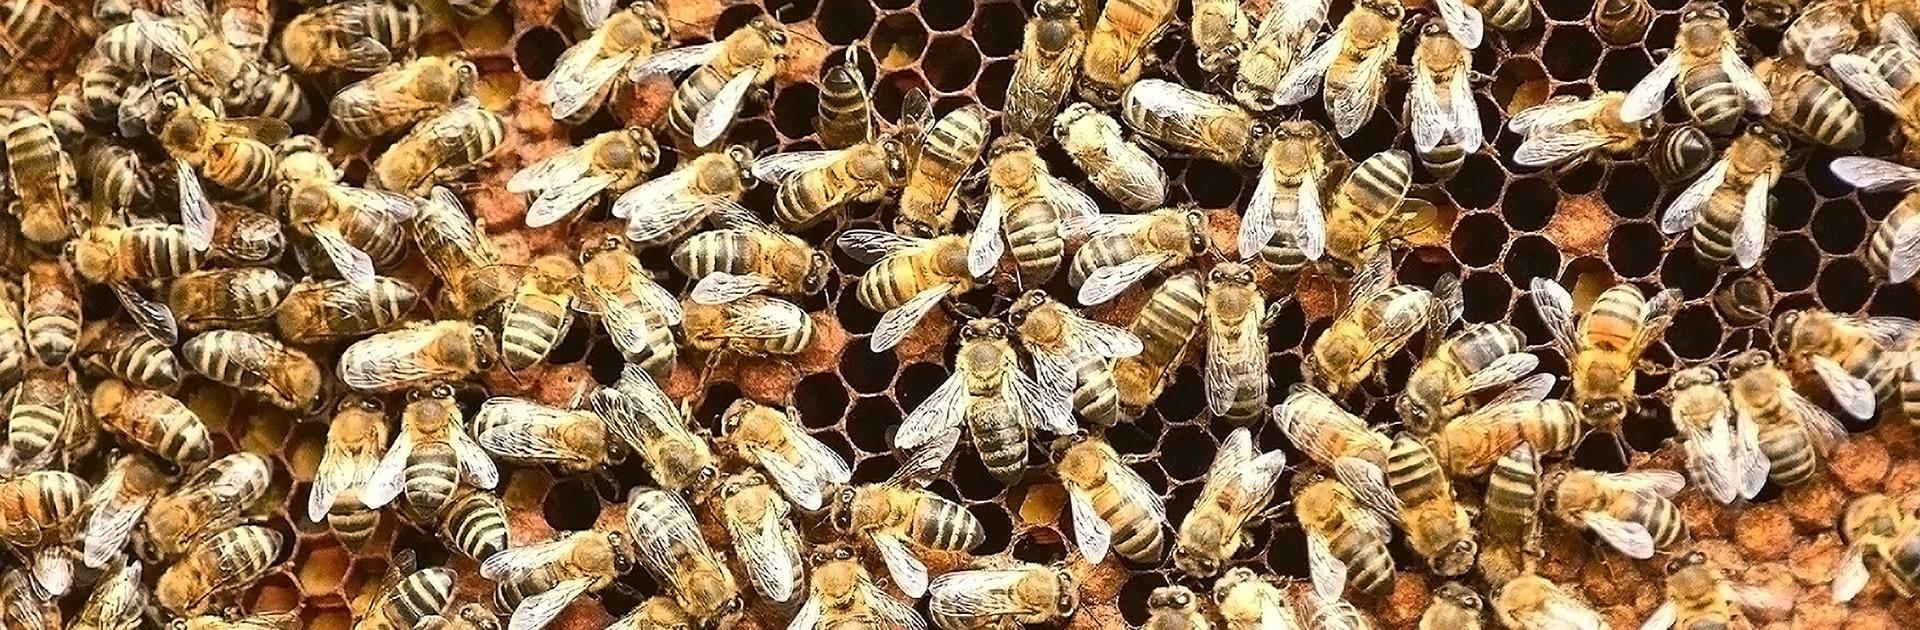 dozens of africanized honey bees on nest